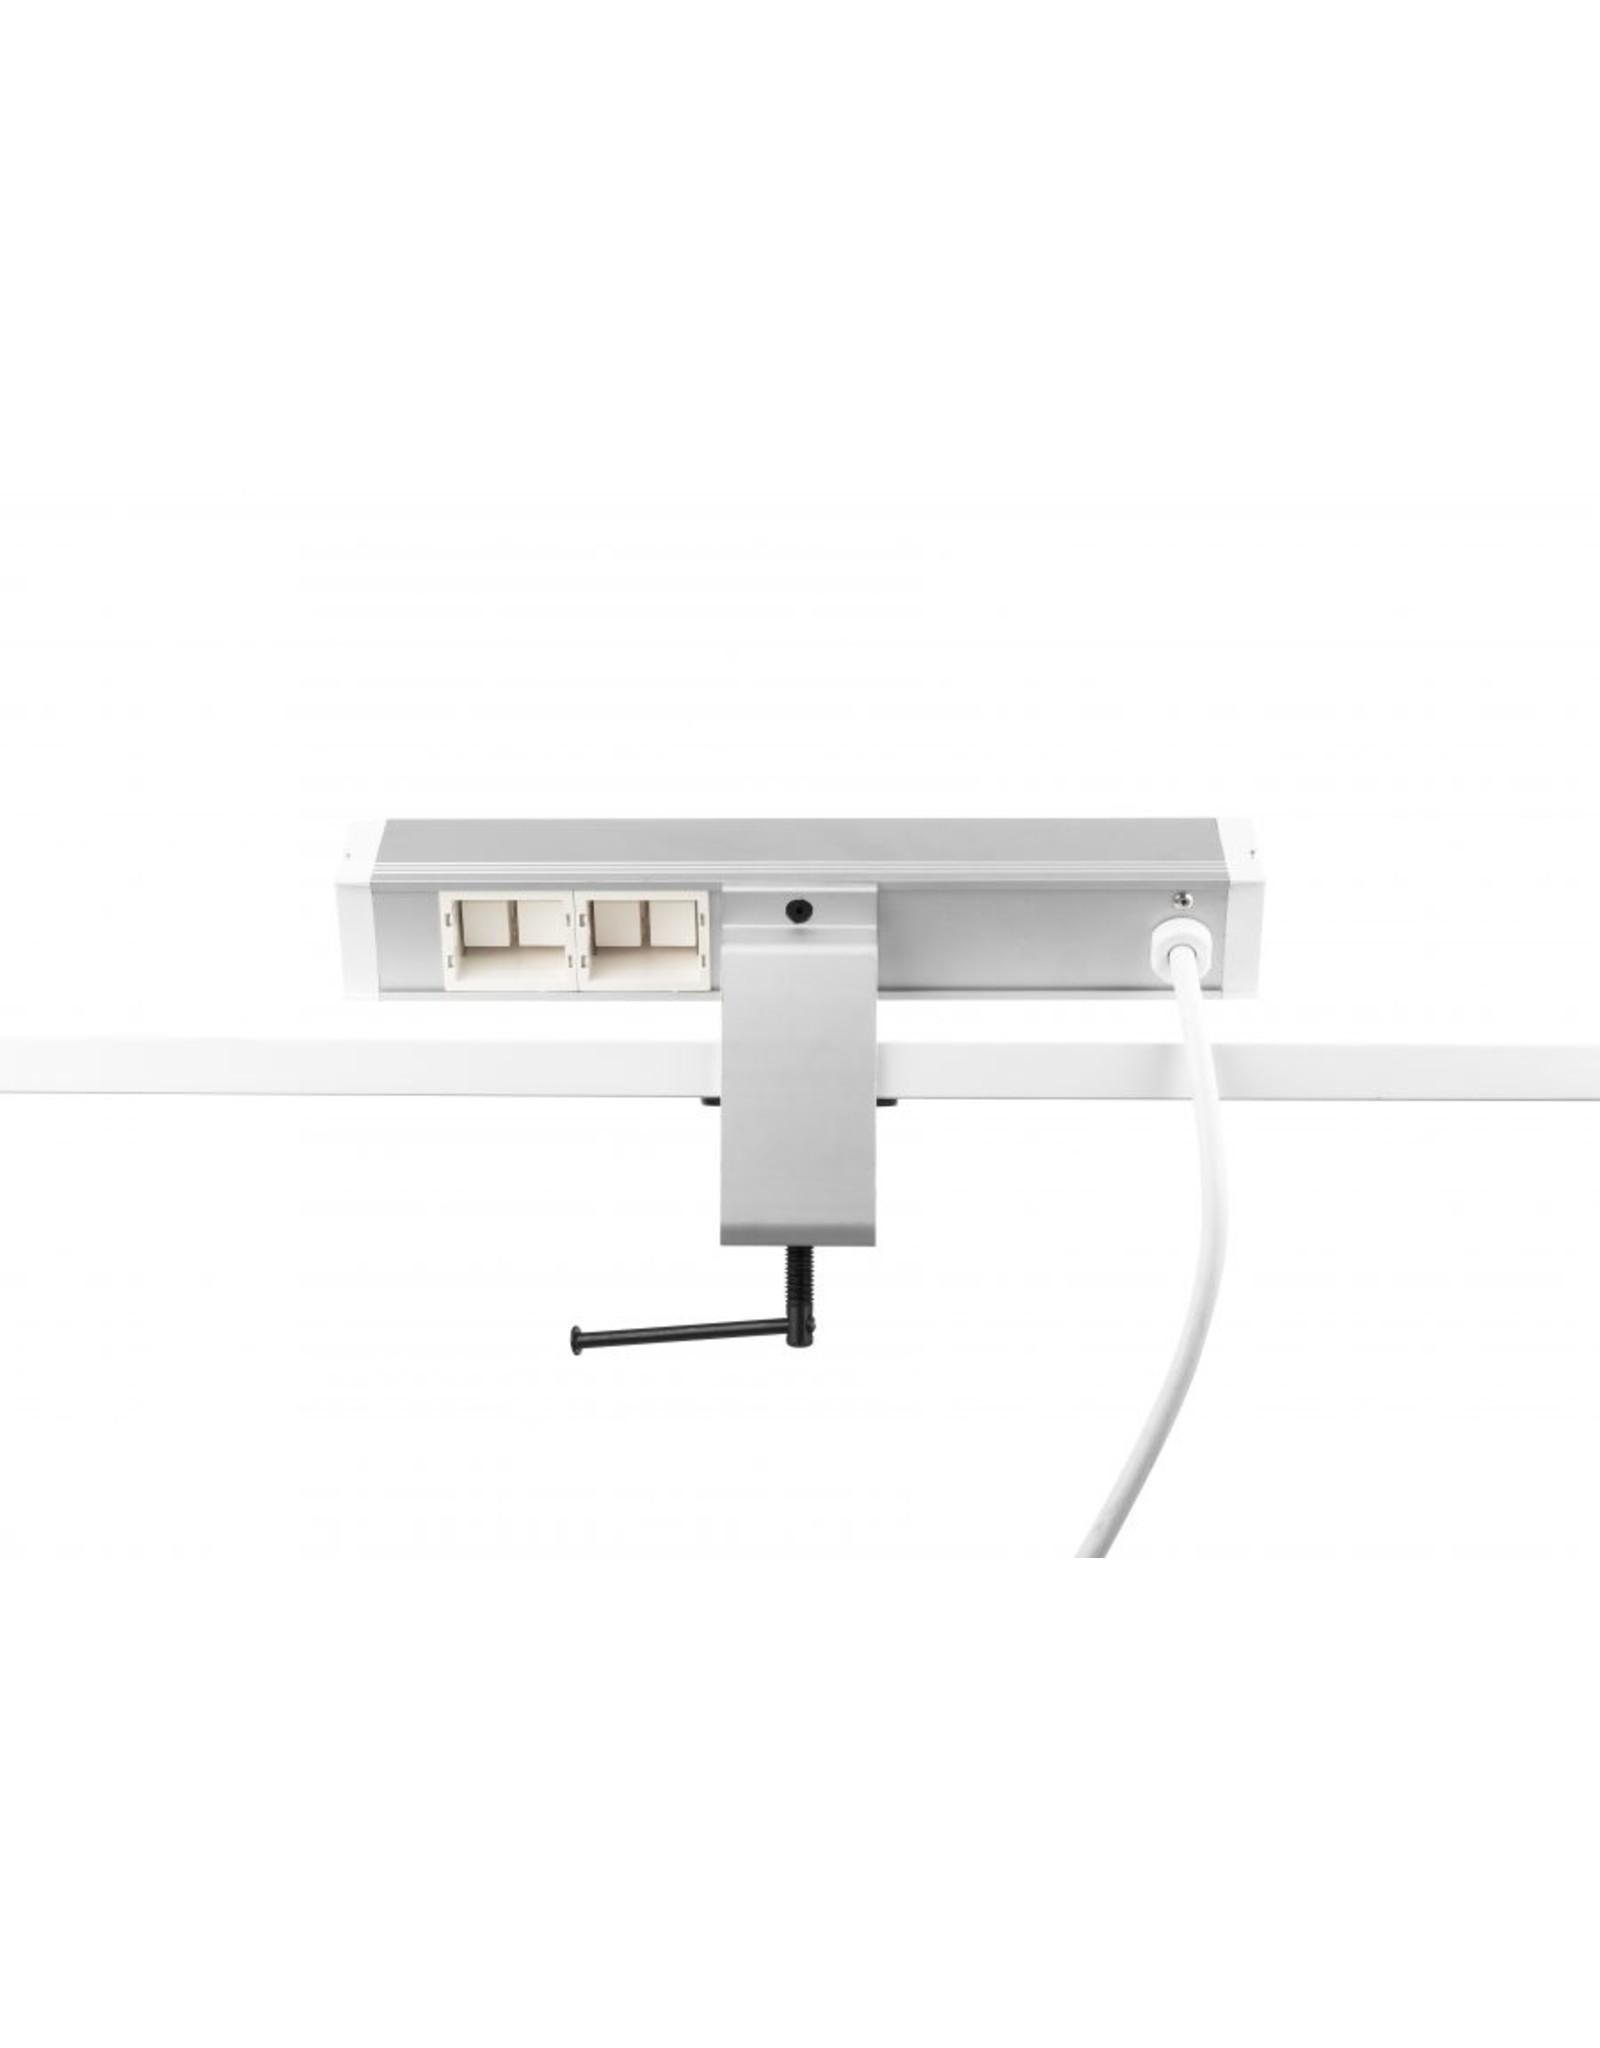 Filex Power Desk up - 2x 230V - 2x USB charger - 2x Keystone